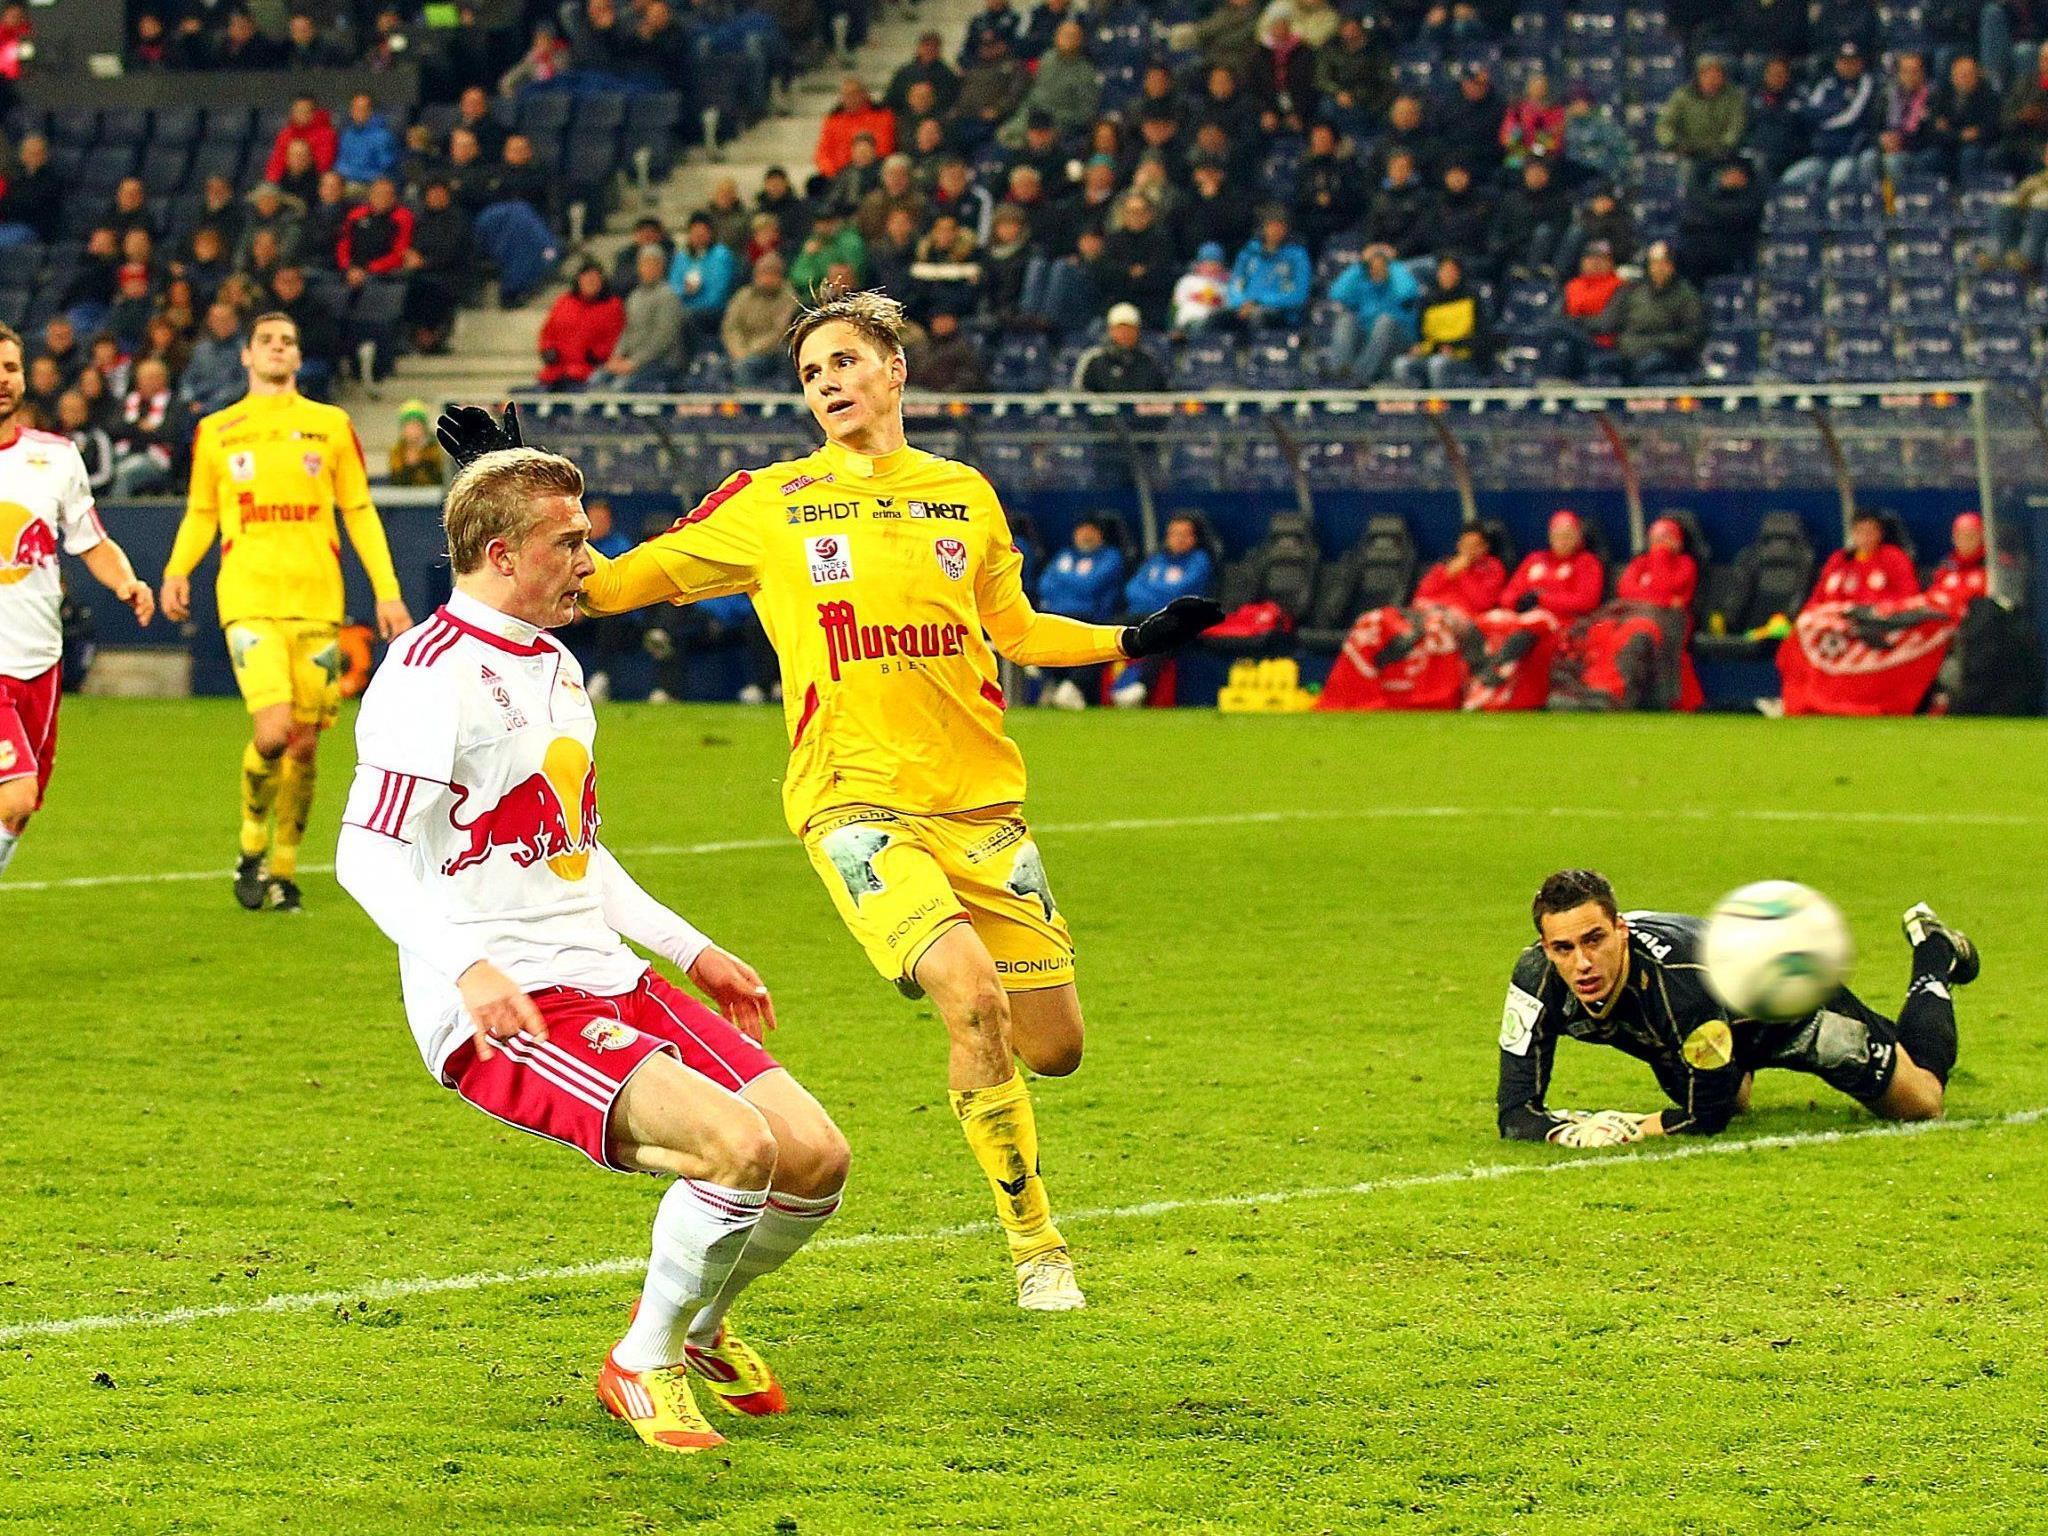 Red Bull Salzburg fertigte den Kapfenberger SV mit 6:0 ab.